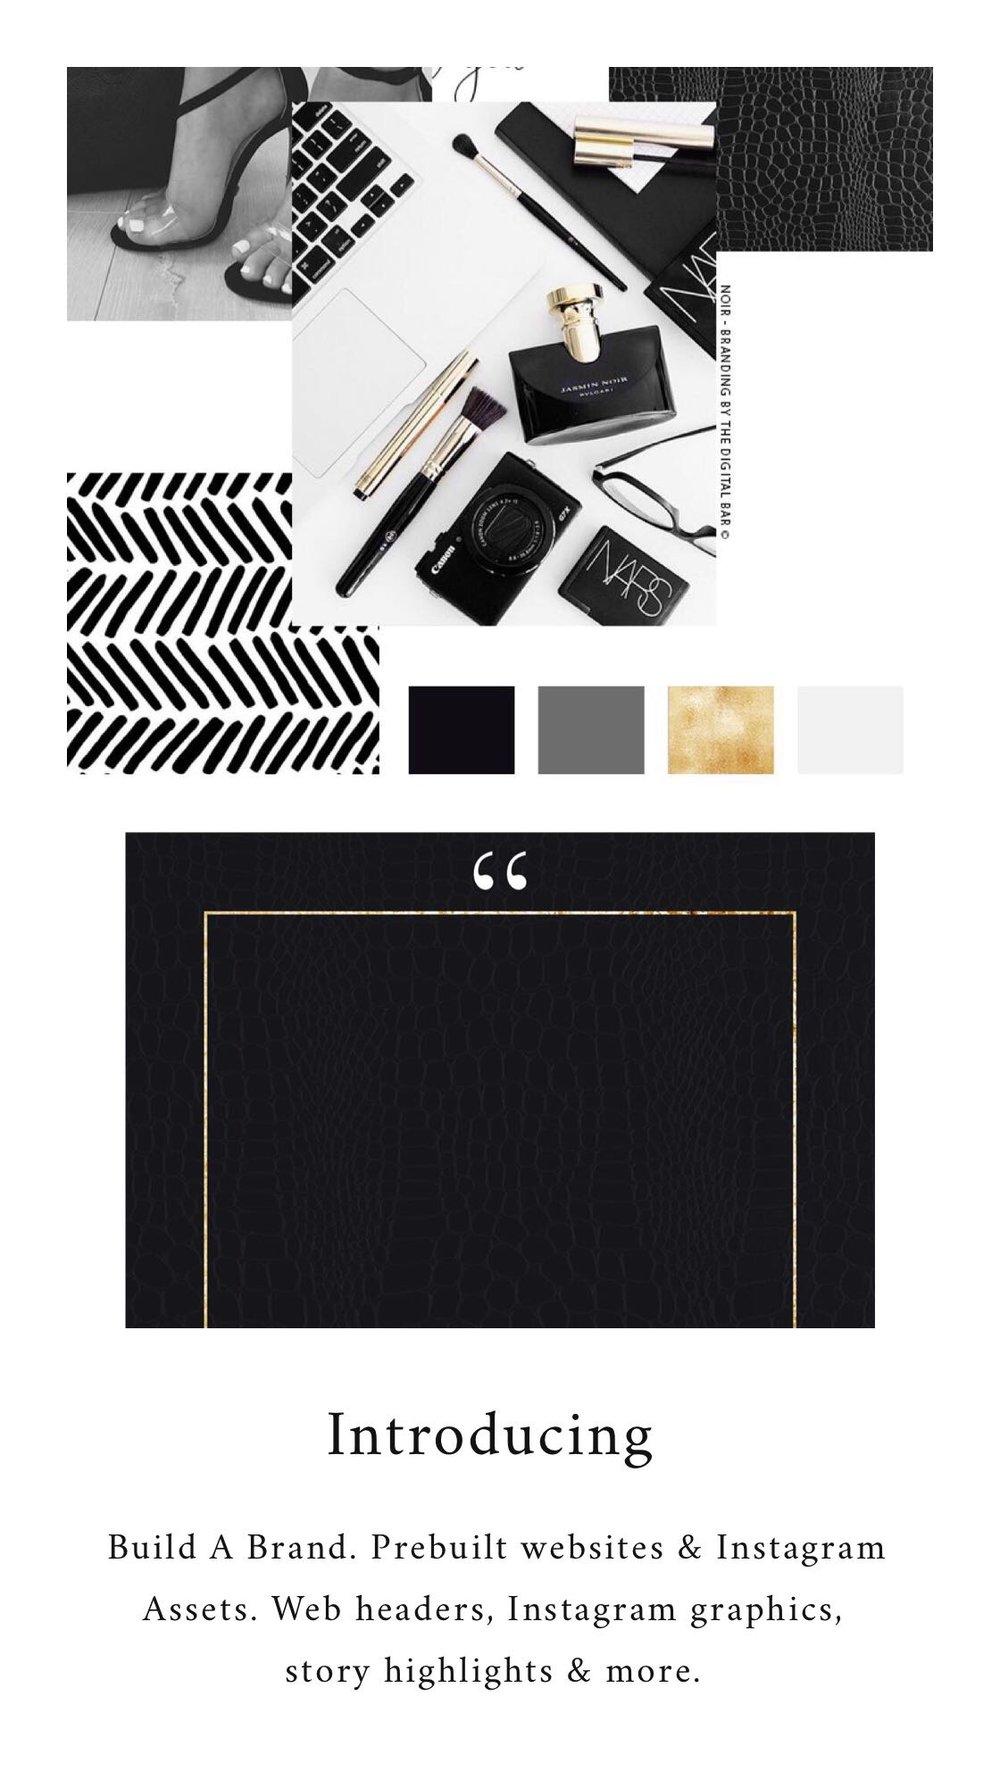 The Noir Brand - $1473 - highlight covers5 - branded posts5 - story templates1 - predesigned brand boardOrder The Noir Brand